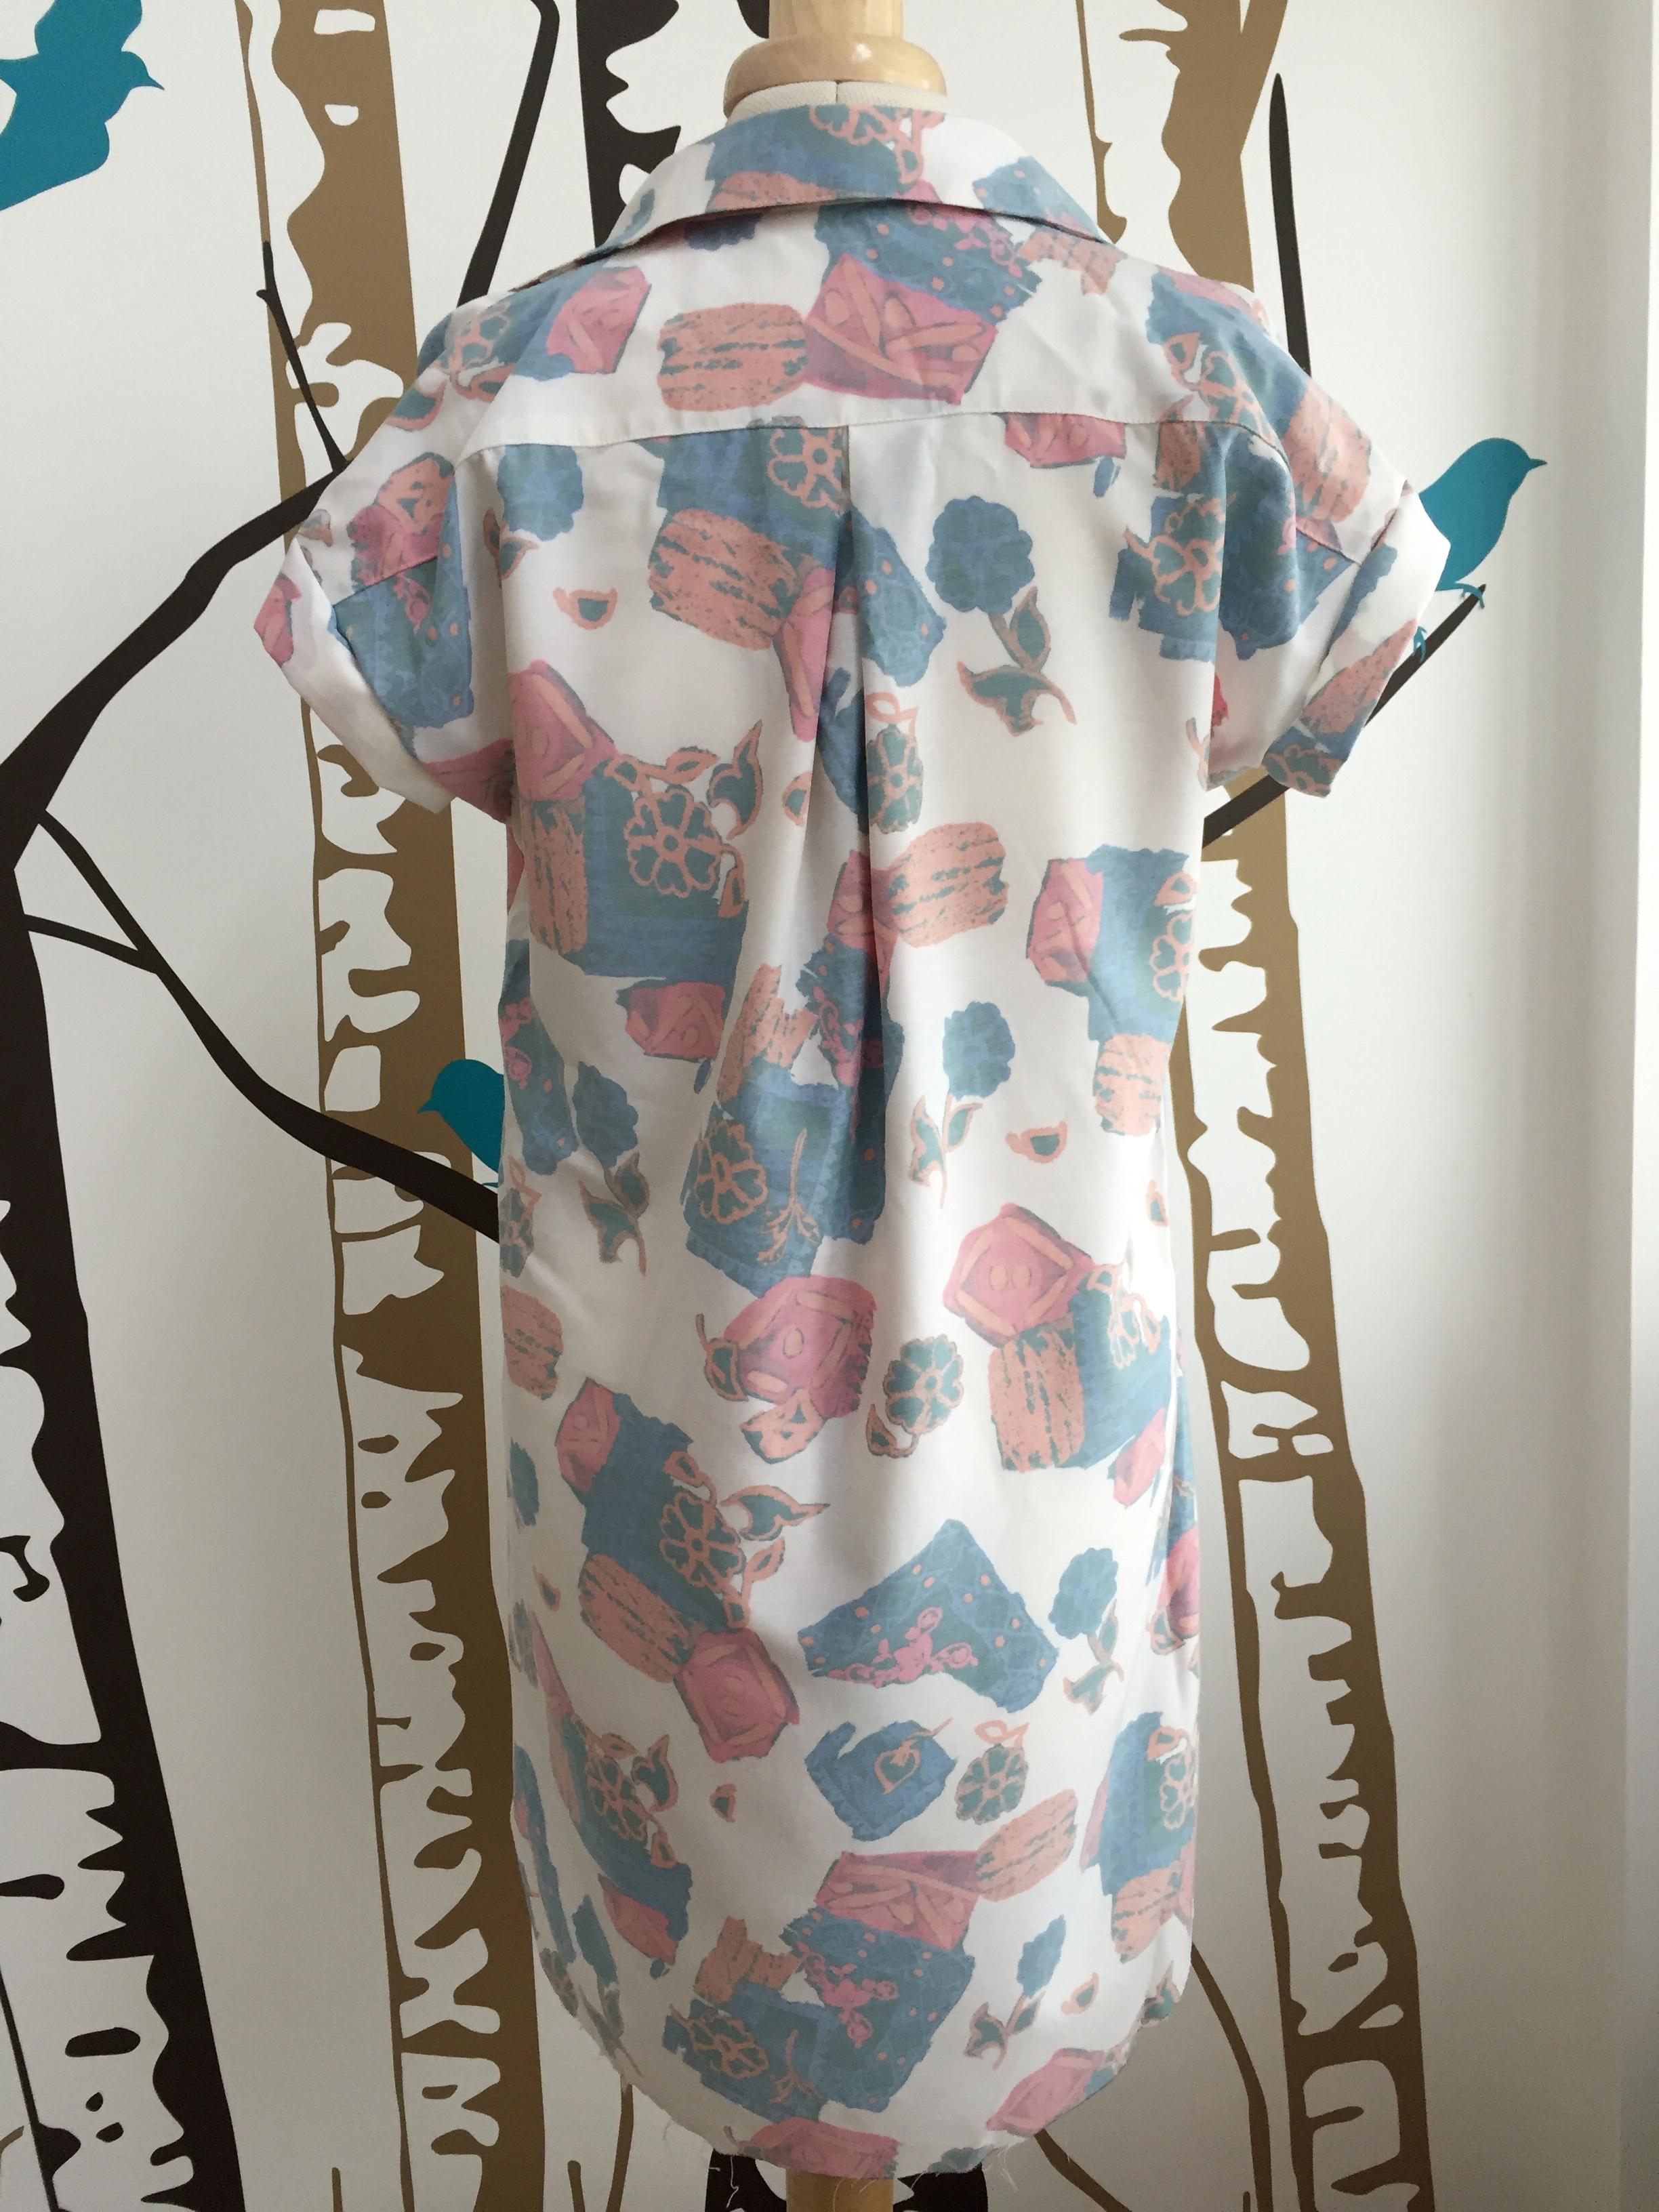 Closet-Case embroidered Kalle shirtdress